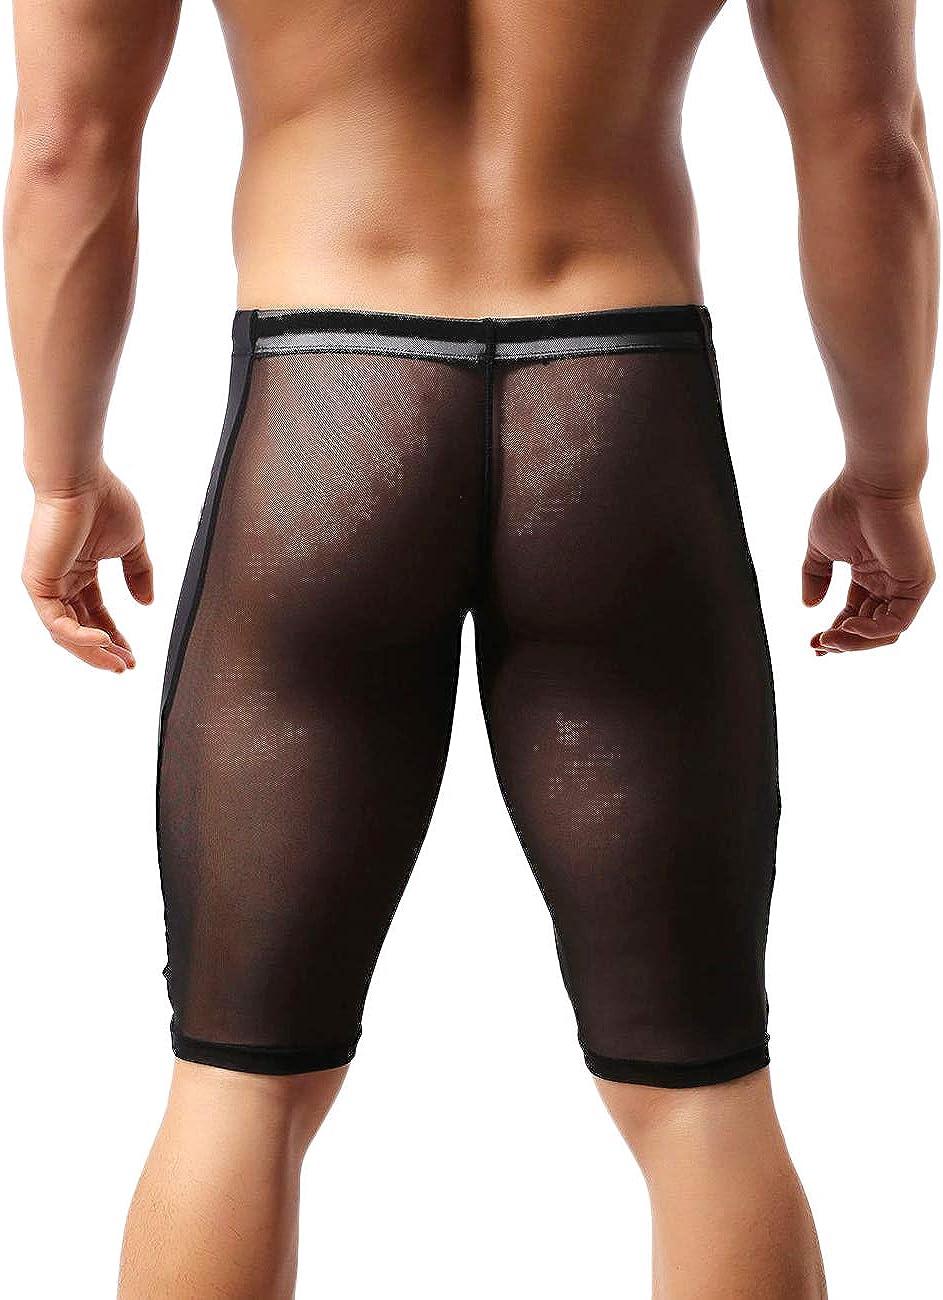 MIZOK Mens Fitness Mesh Shorts Yoga Capris See Through Jammer Swimsuit Beachwear